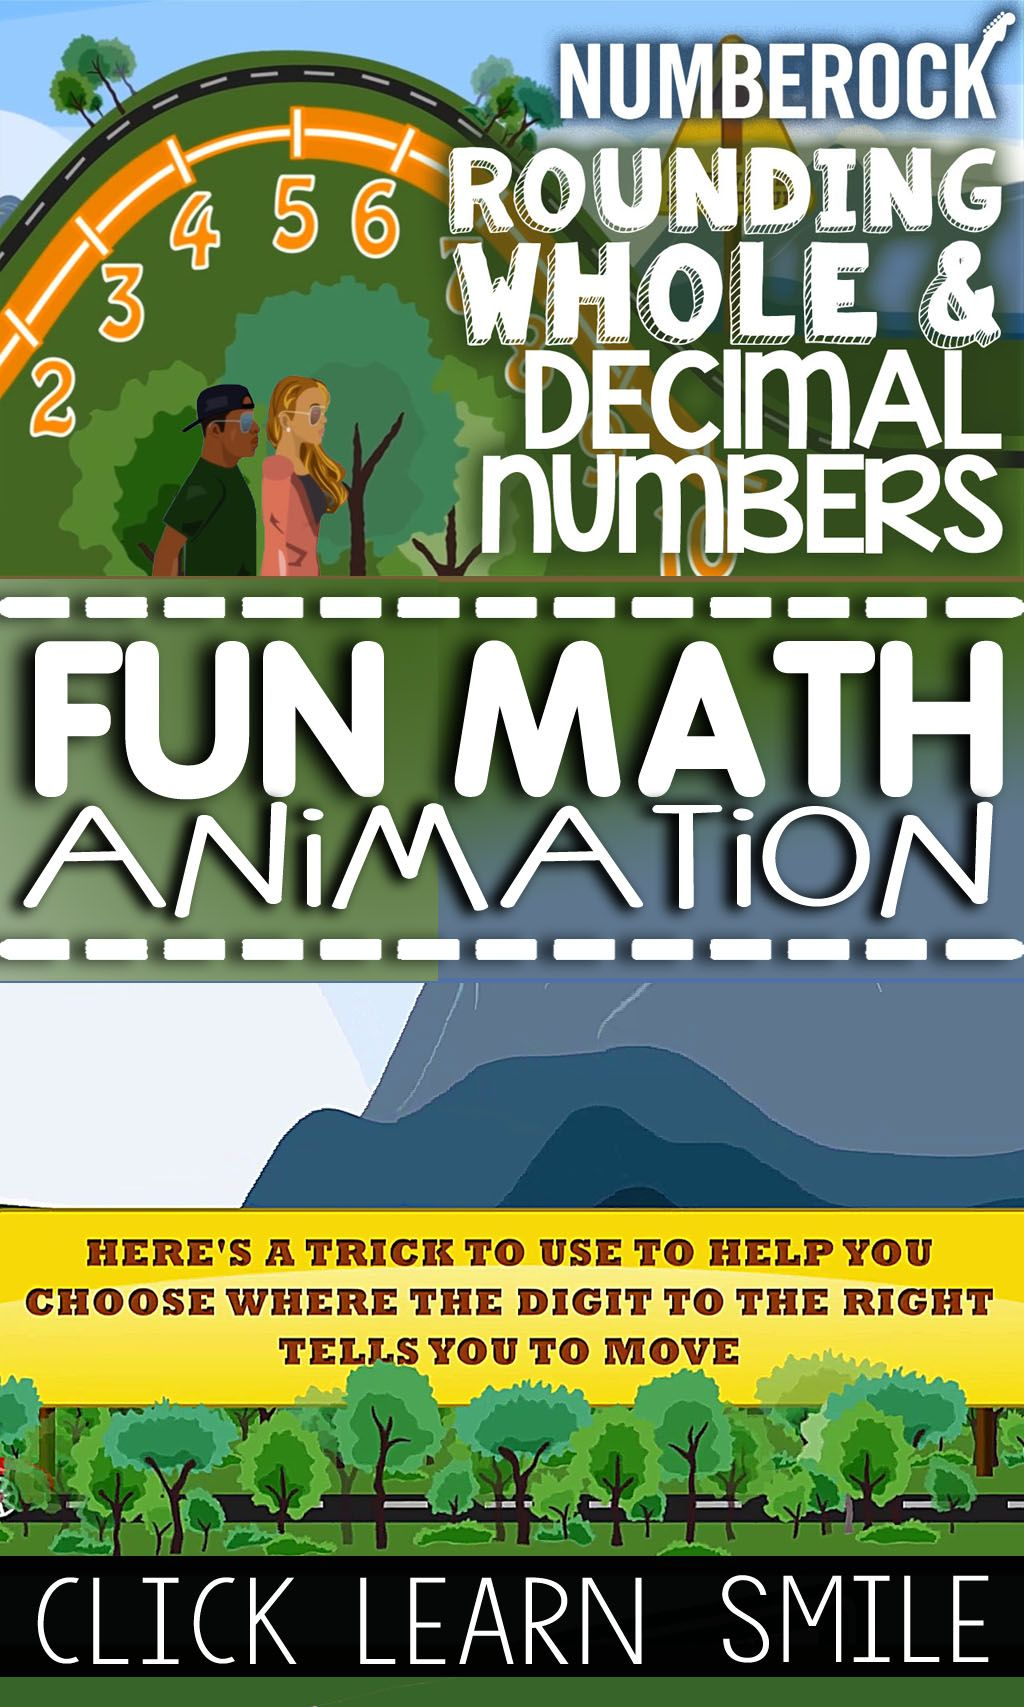 18 4th Grade Math Songs ideas   math songs [ 1707 x 1024 Pixel ]